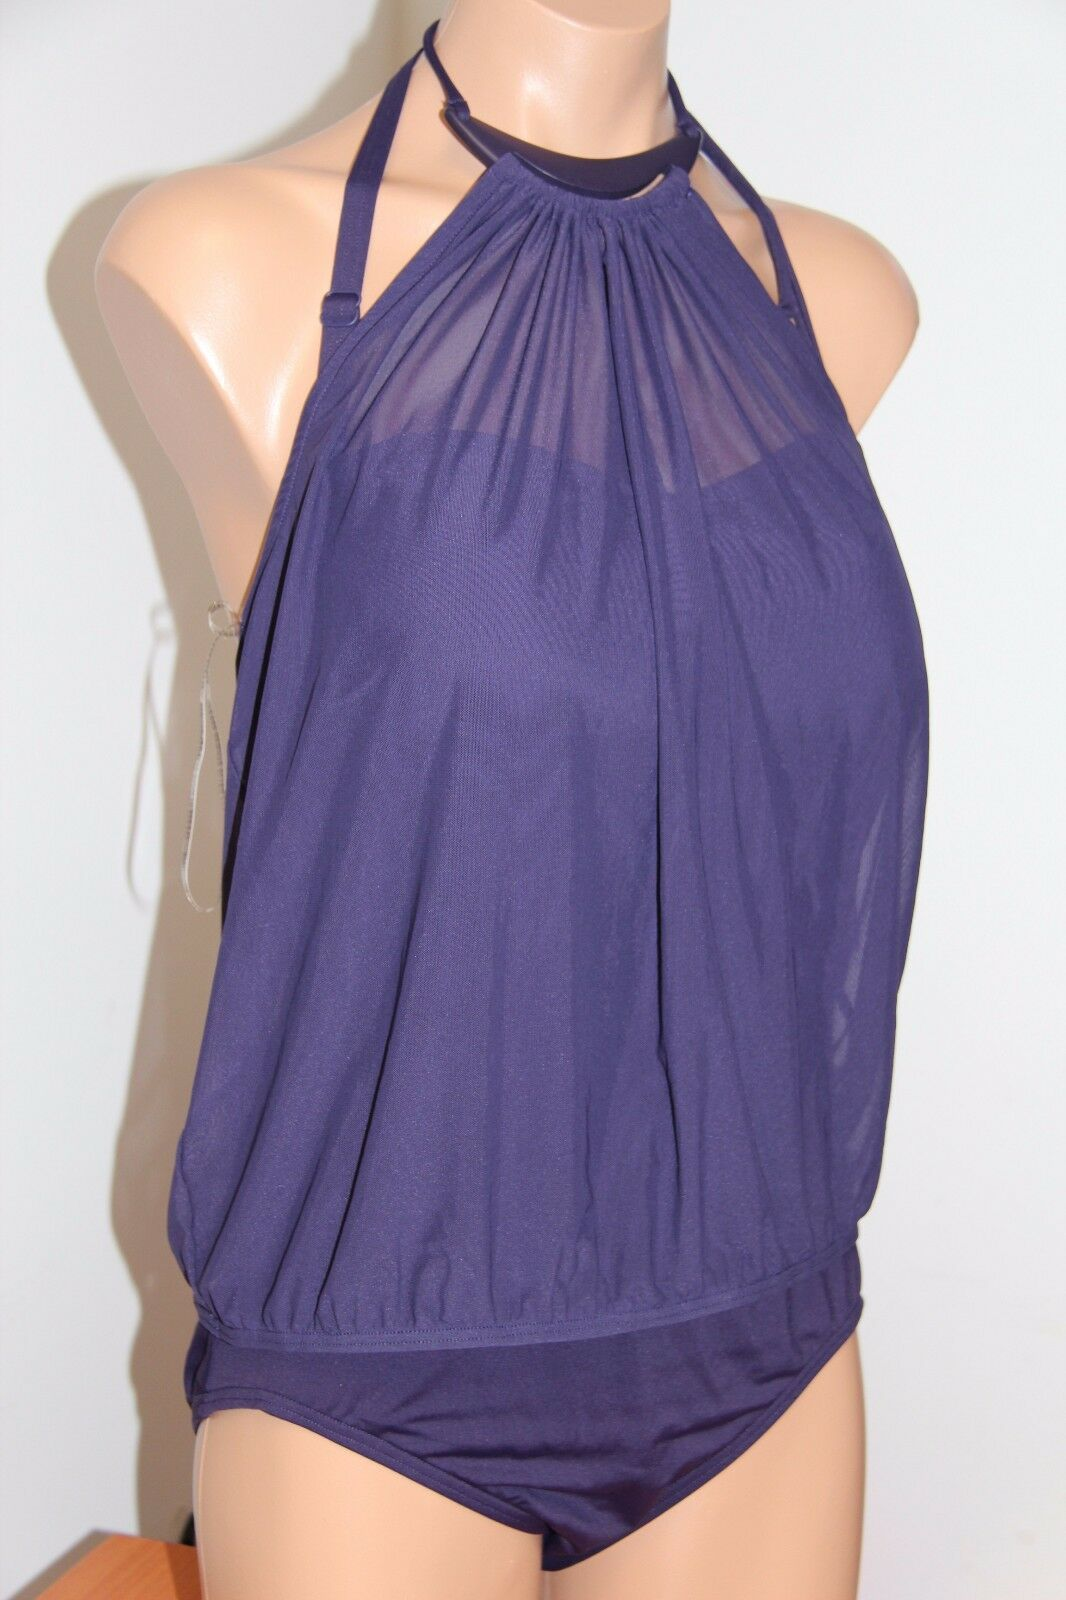 NWT Coco Reef Swimsuit Bikini 1 one  piece Sz 10 34D Deep Amethyst